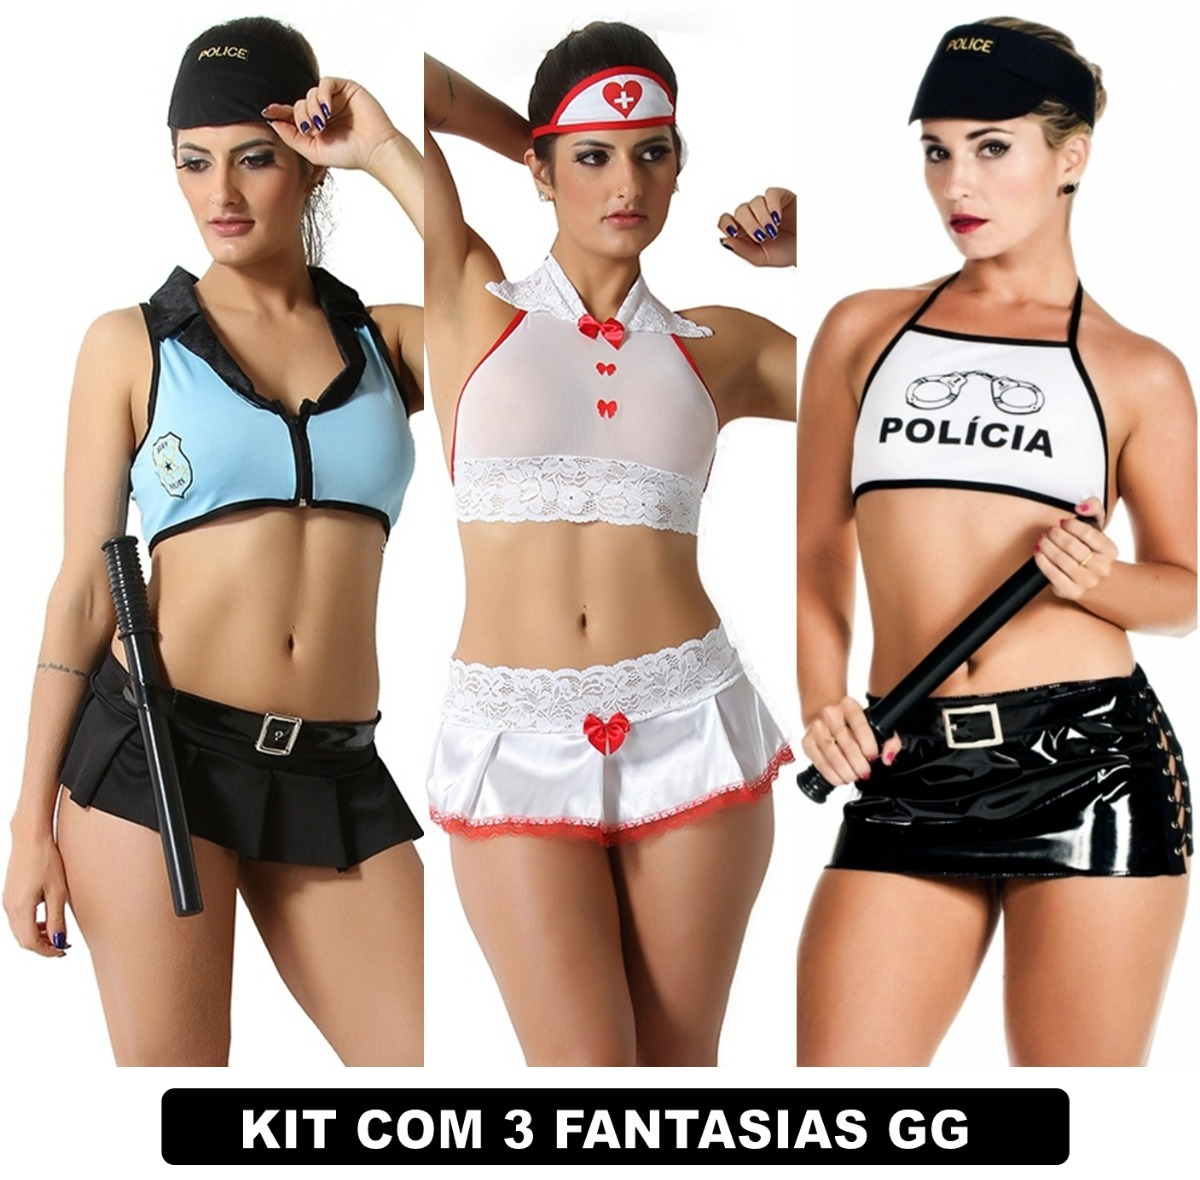 bcbef2181 moda íntima fantasia plus size feminino kit com 3 uni gg. Carregando zoom.